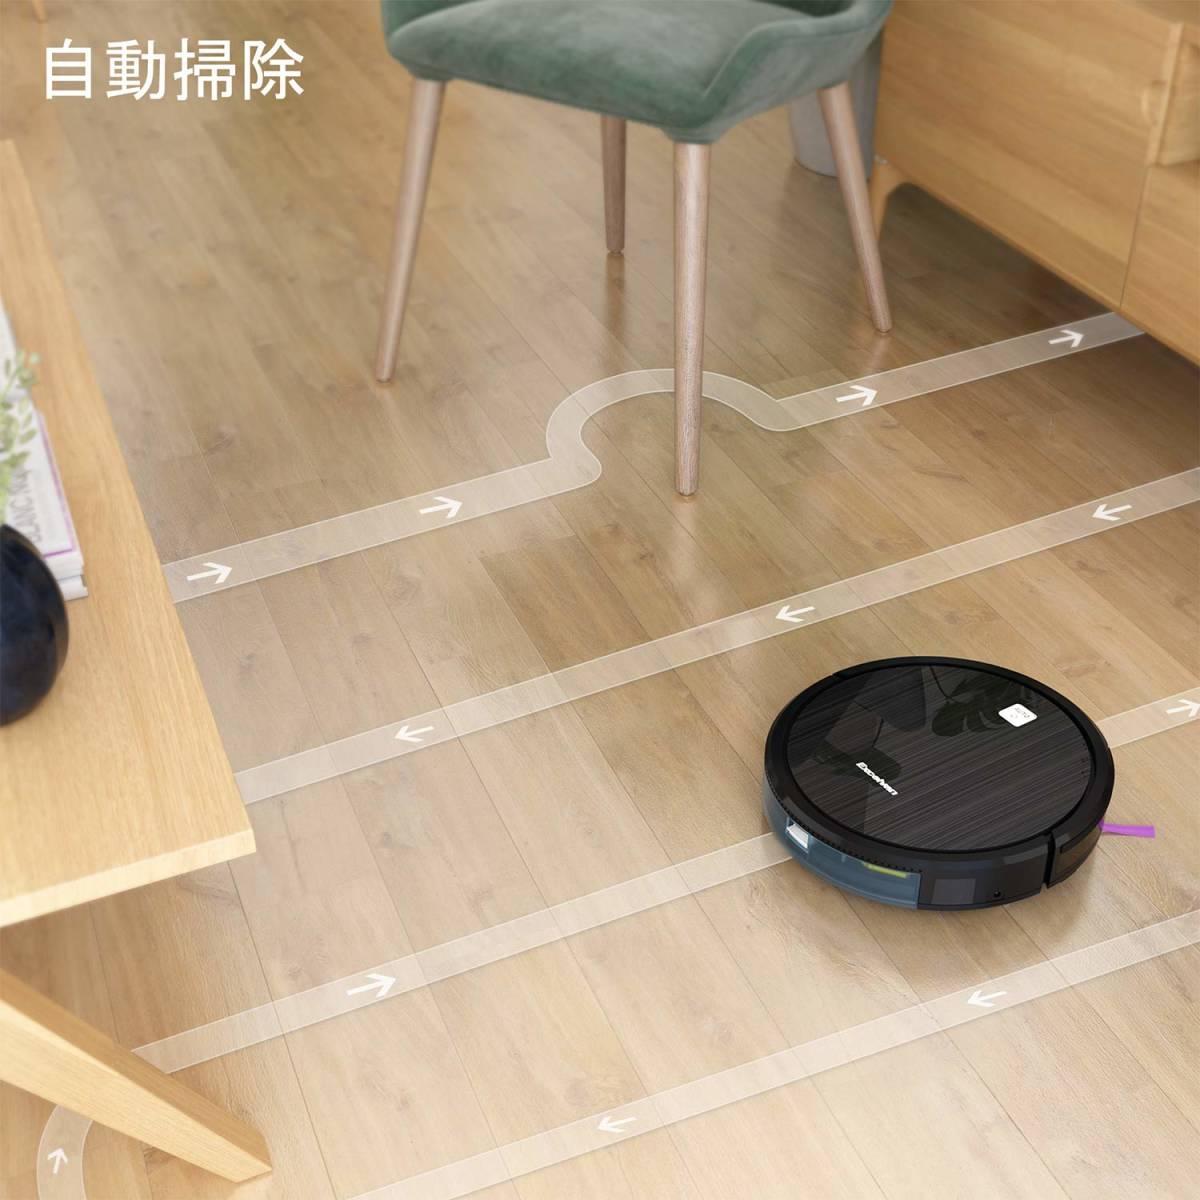 Excelvan D35 ロボット掃除機 スマートな計画式掃除 ロボット型クリーナー 4つの清掃モード 1600Paの強力吸引 120分長時間稼動 自動充電_画像8